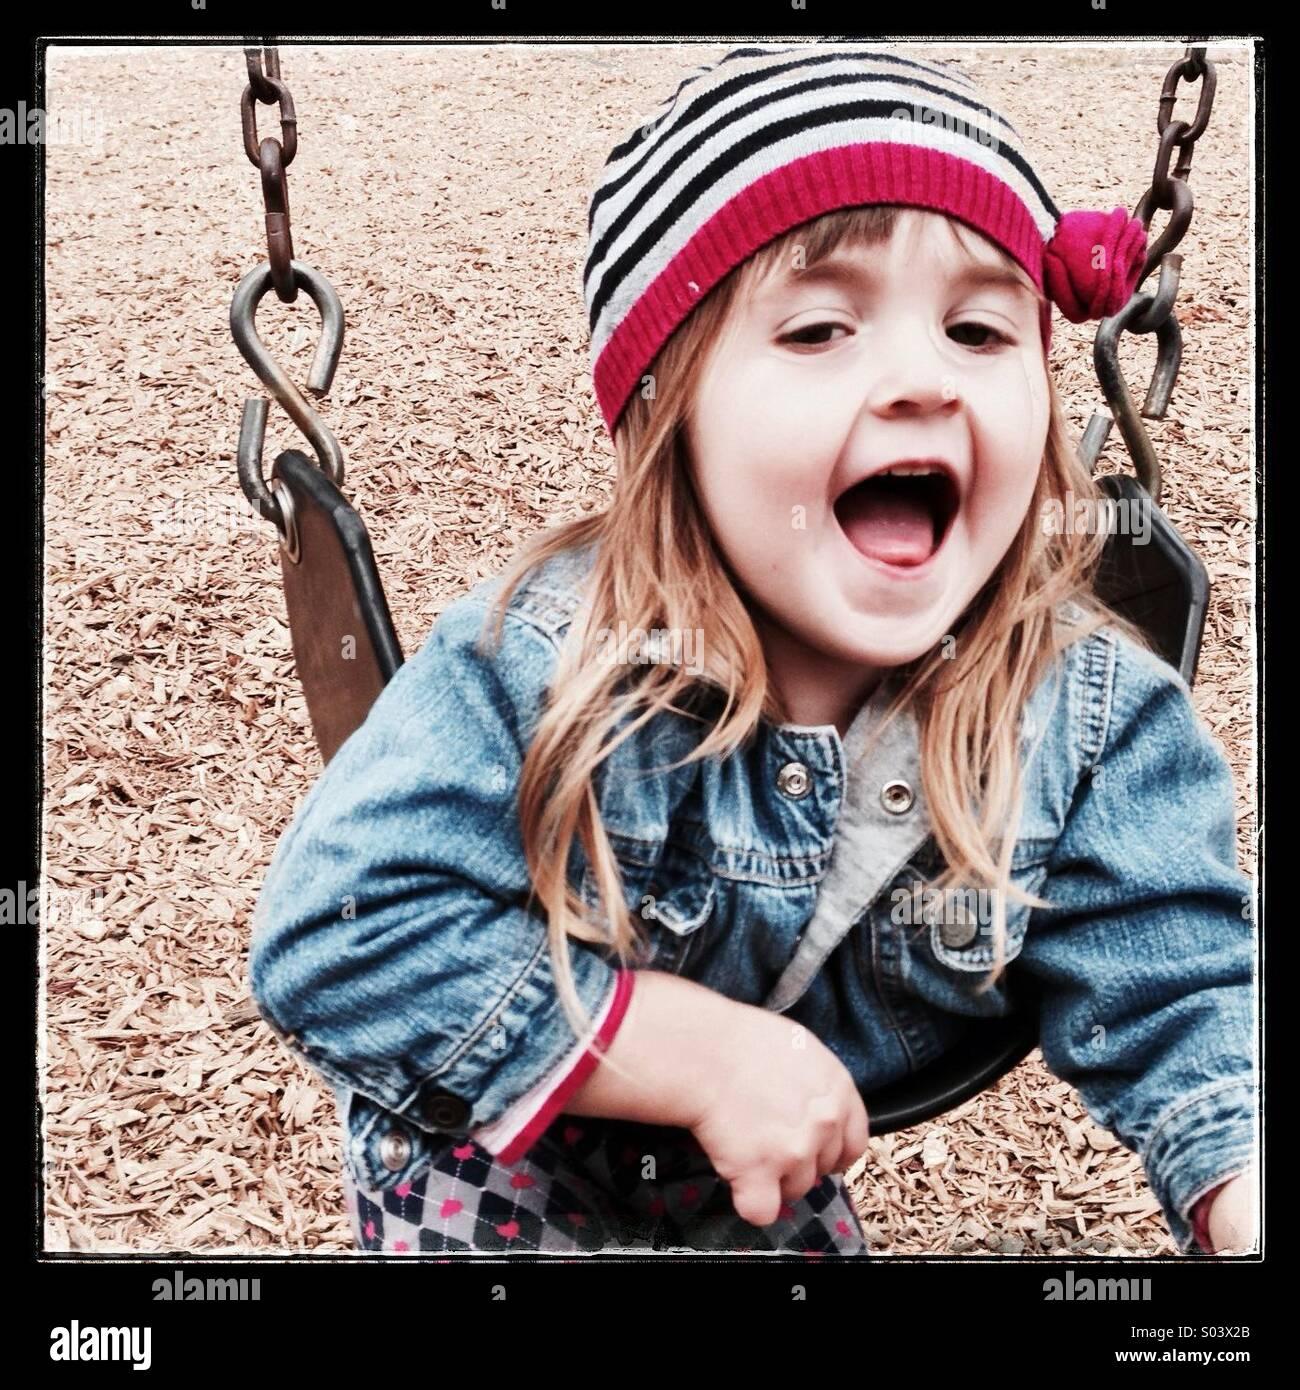 Toddler Caucasian girl having fun on a swing - Stock Image